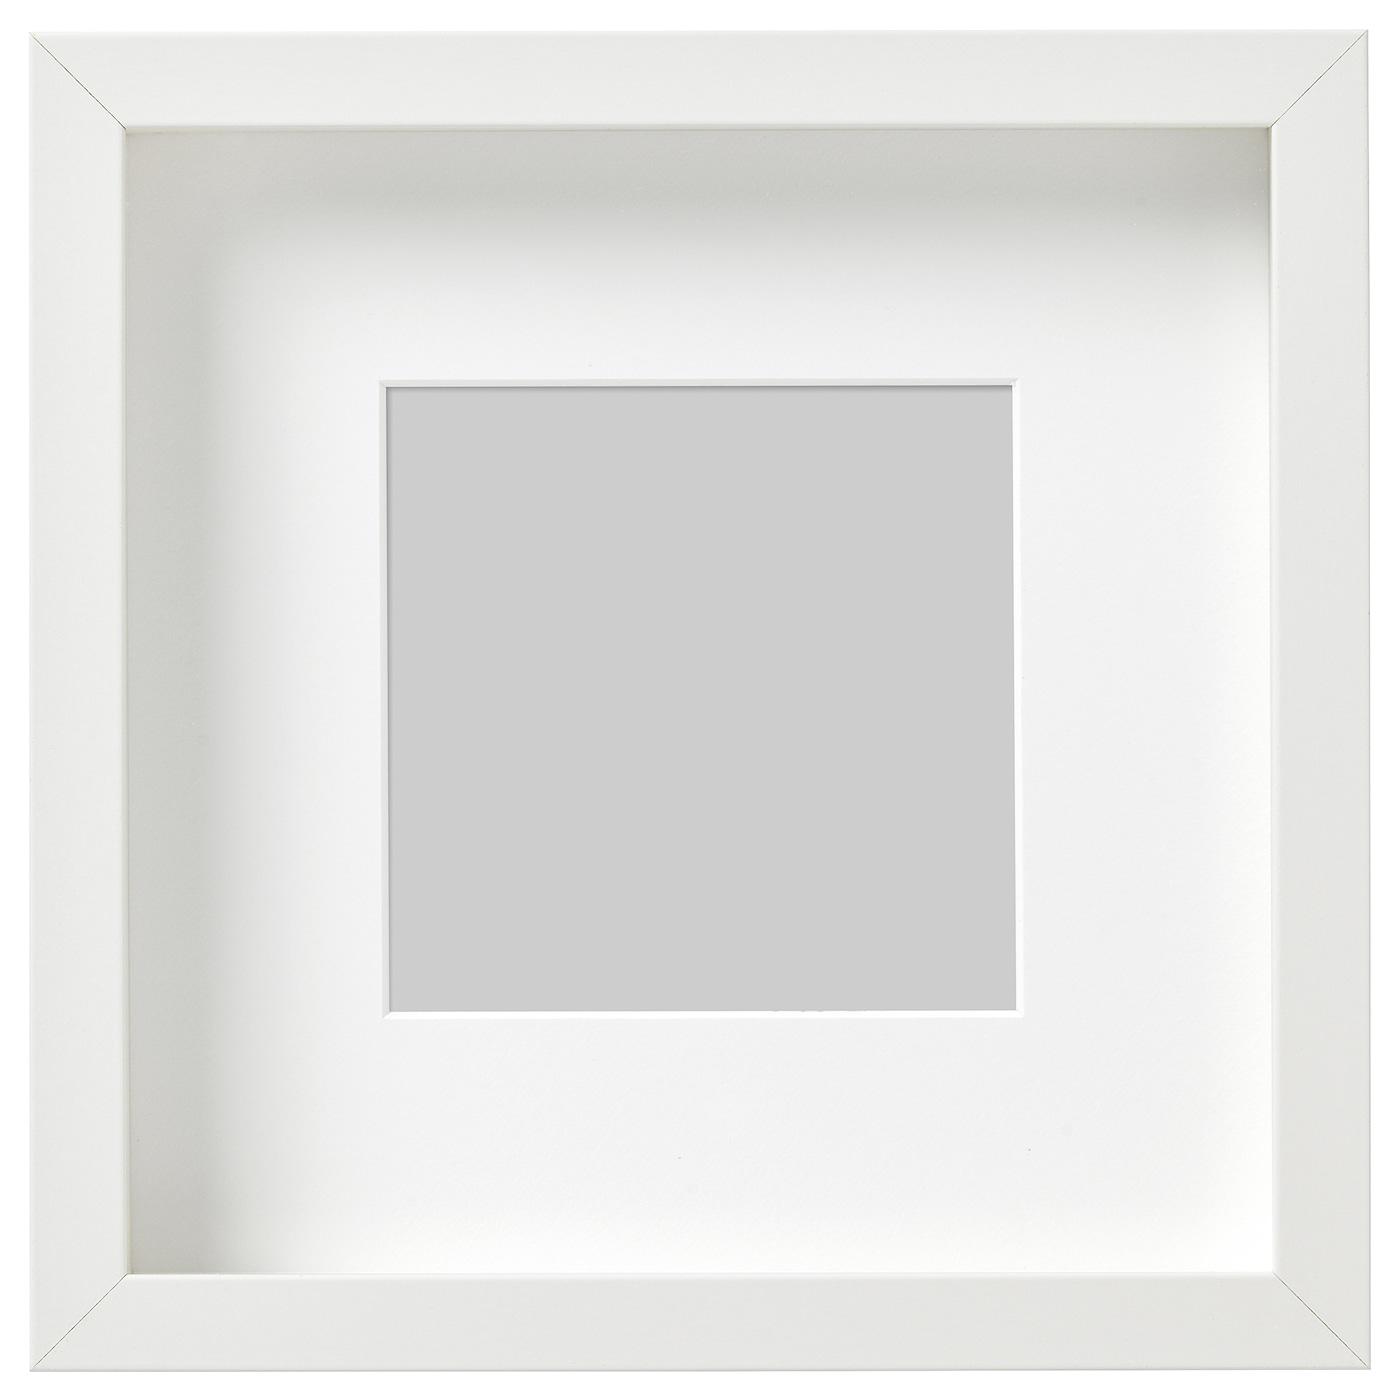 RIBBA Marco Blanco 23 x 23 cm - IKEA